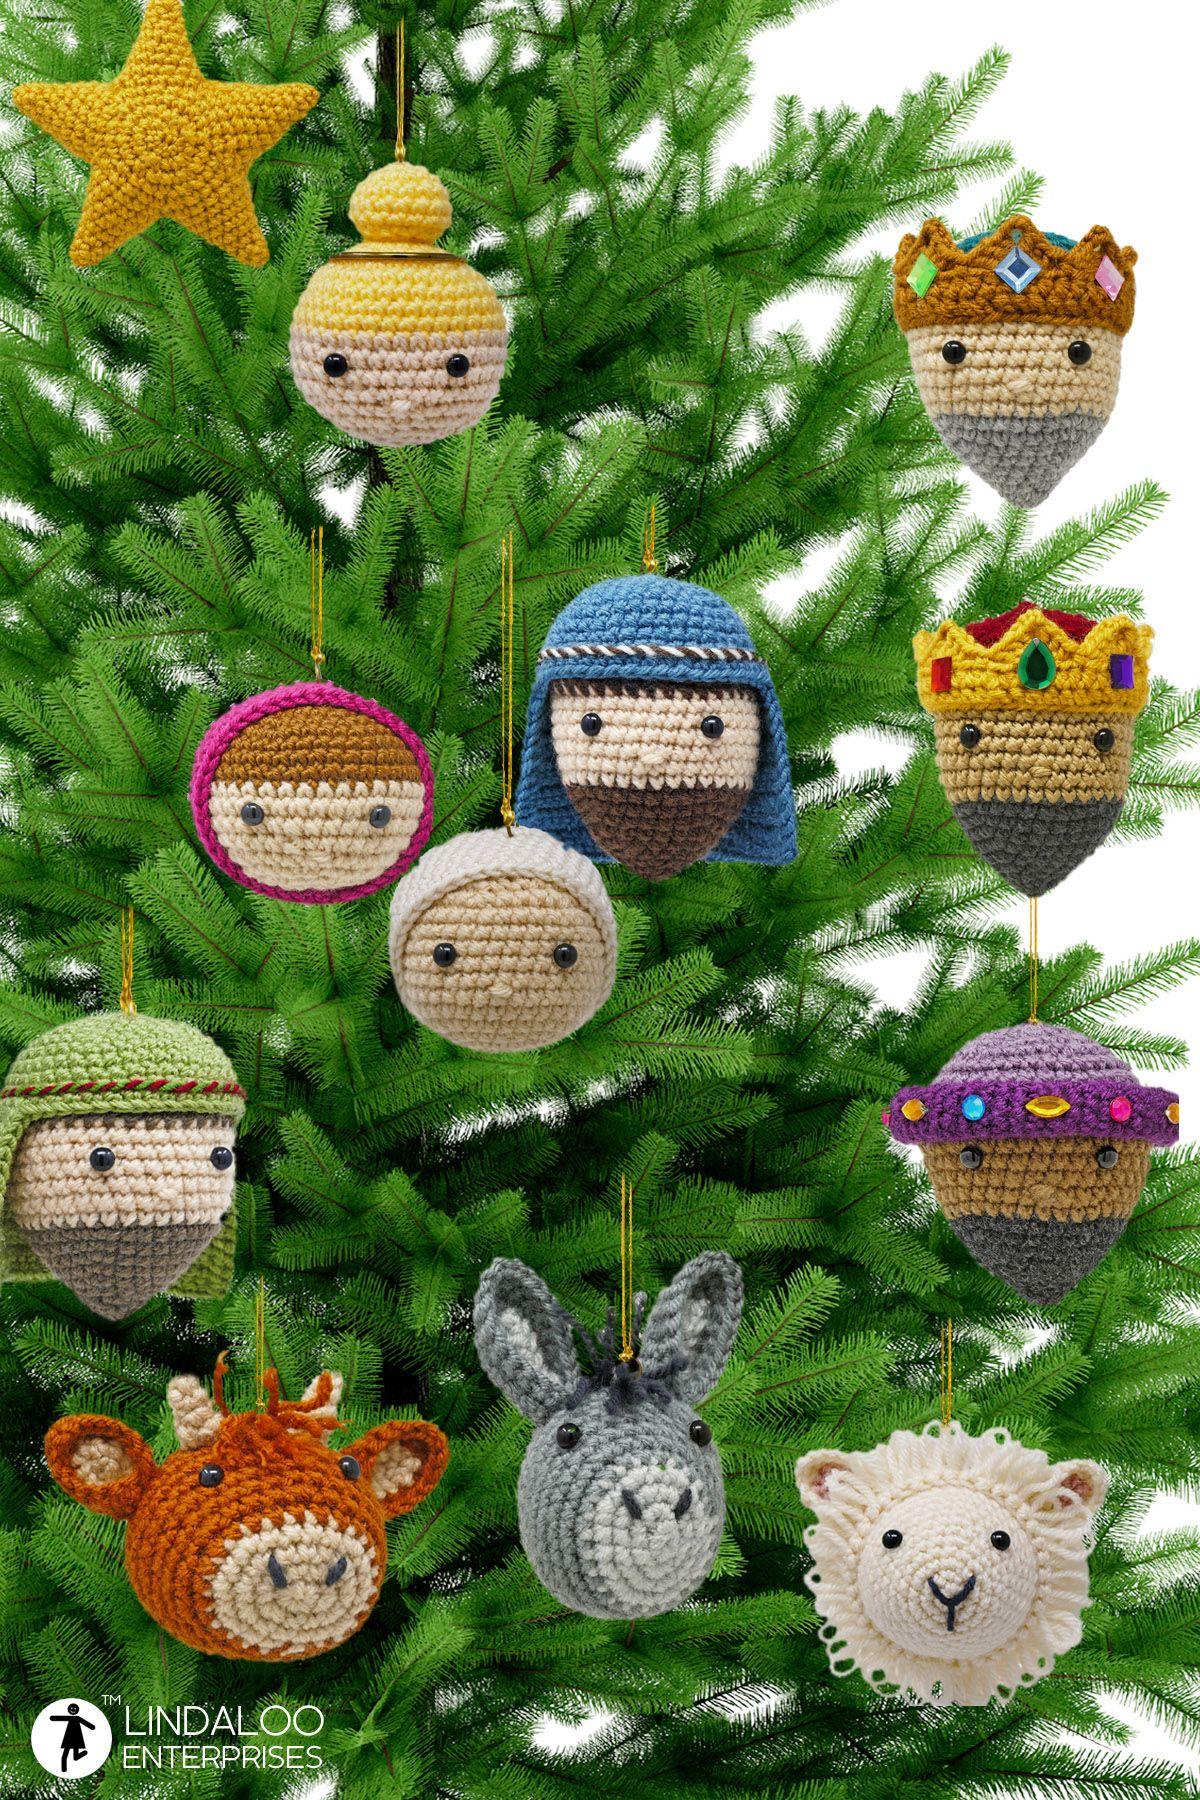 Nativity Crocheted Christmas Ornaments Christmas Crochet Patterns Crochet Christmas Decorations Christmas Crochet